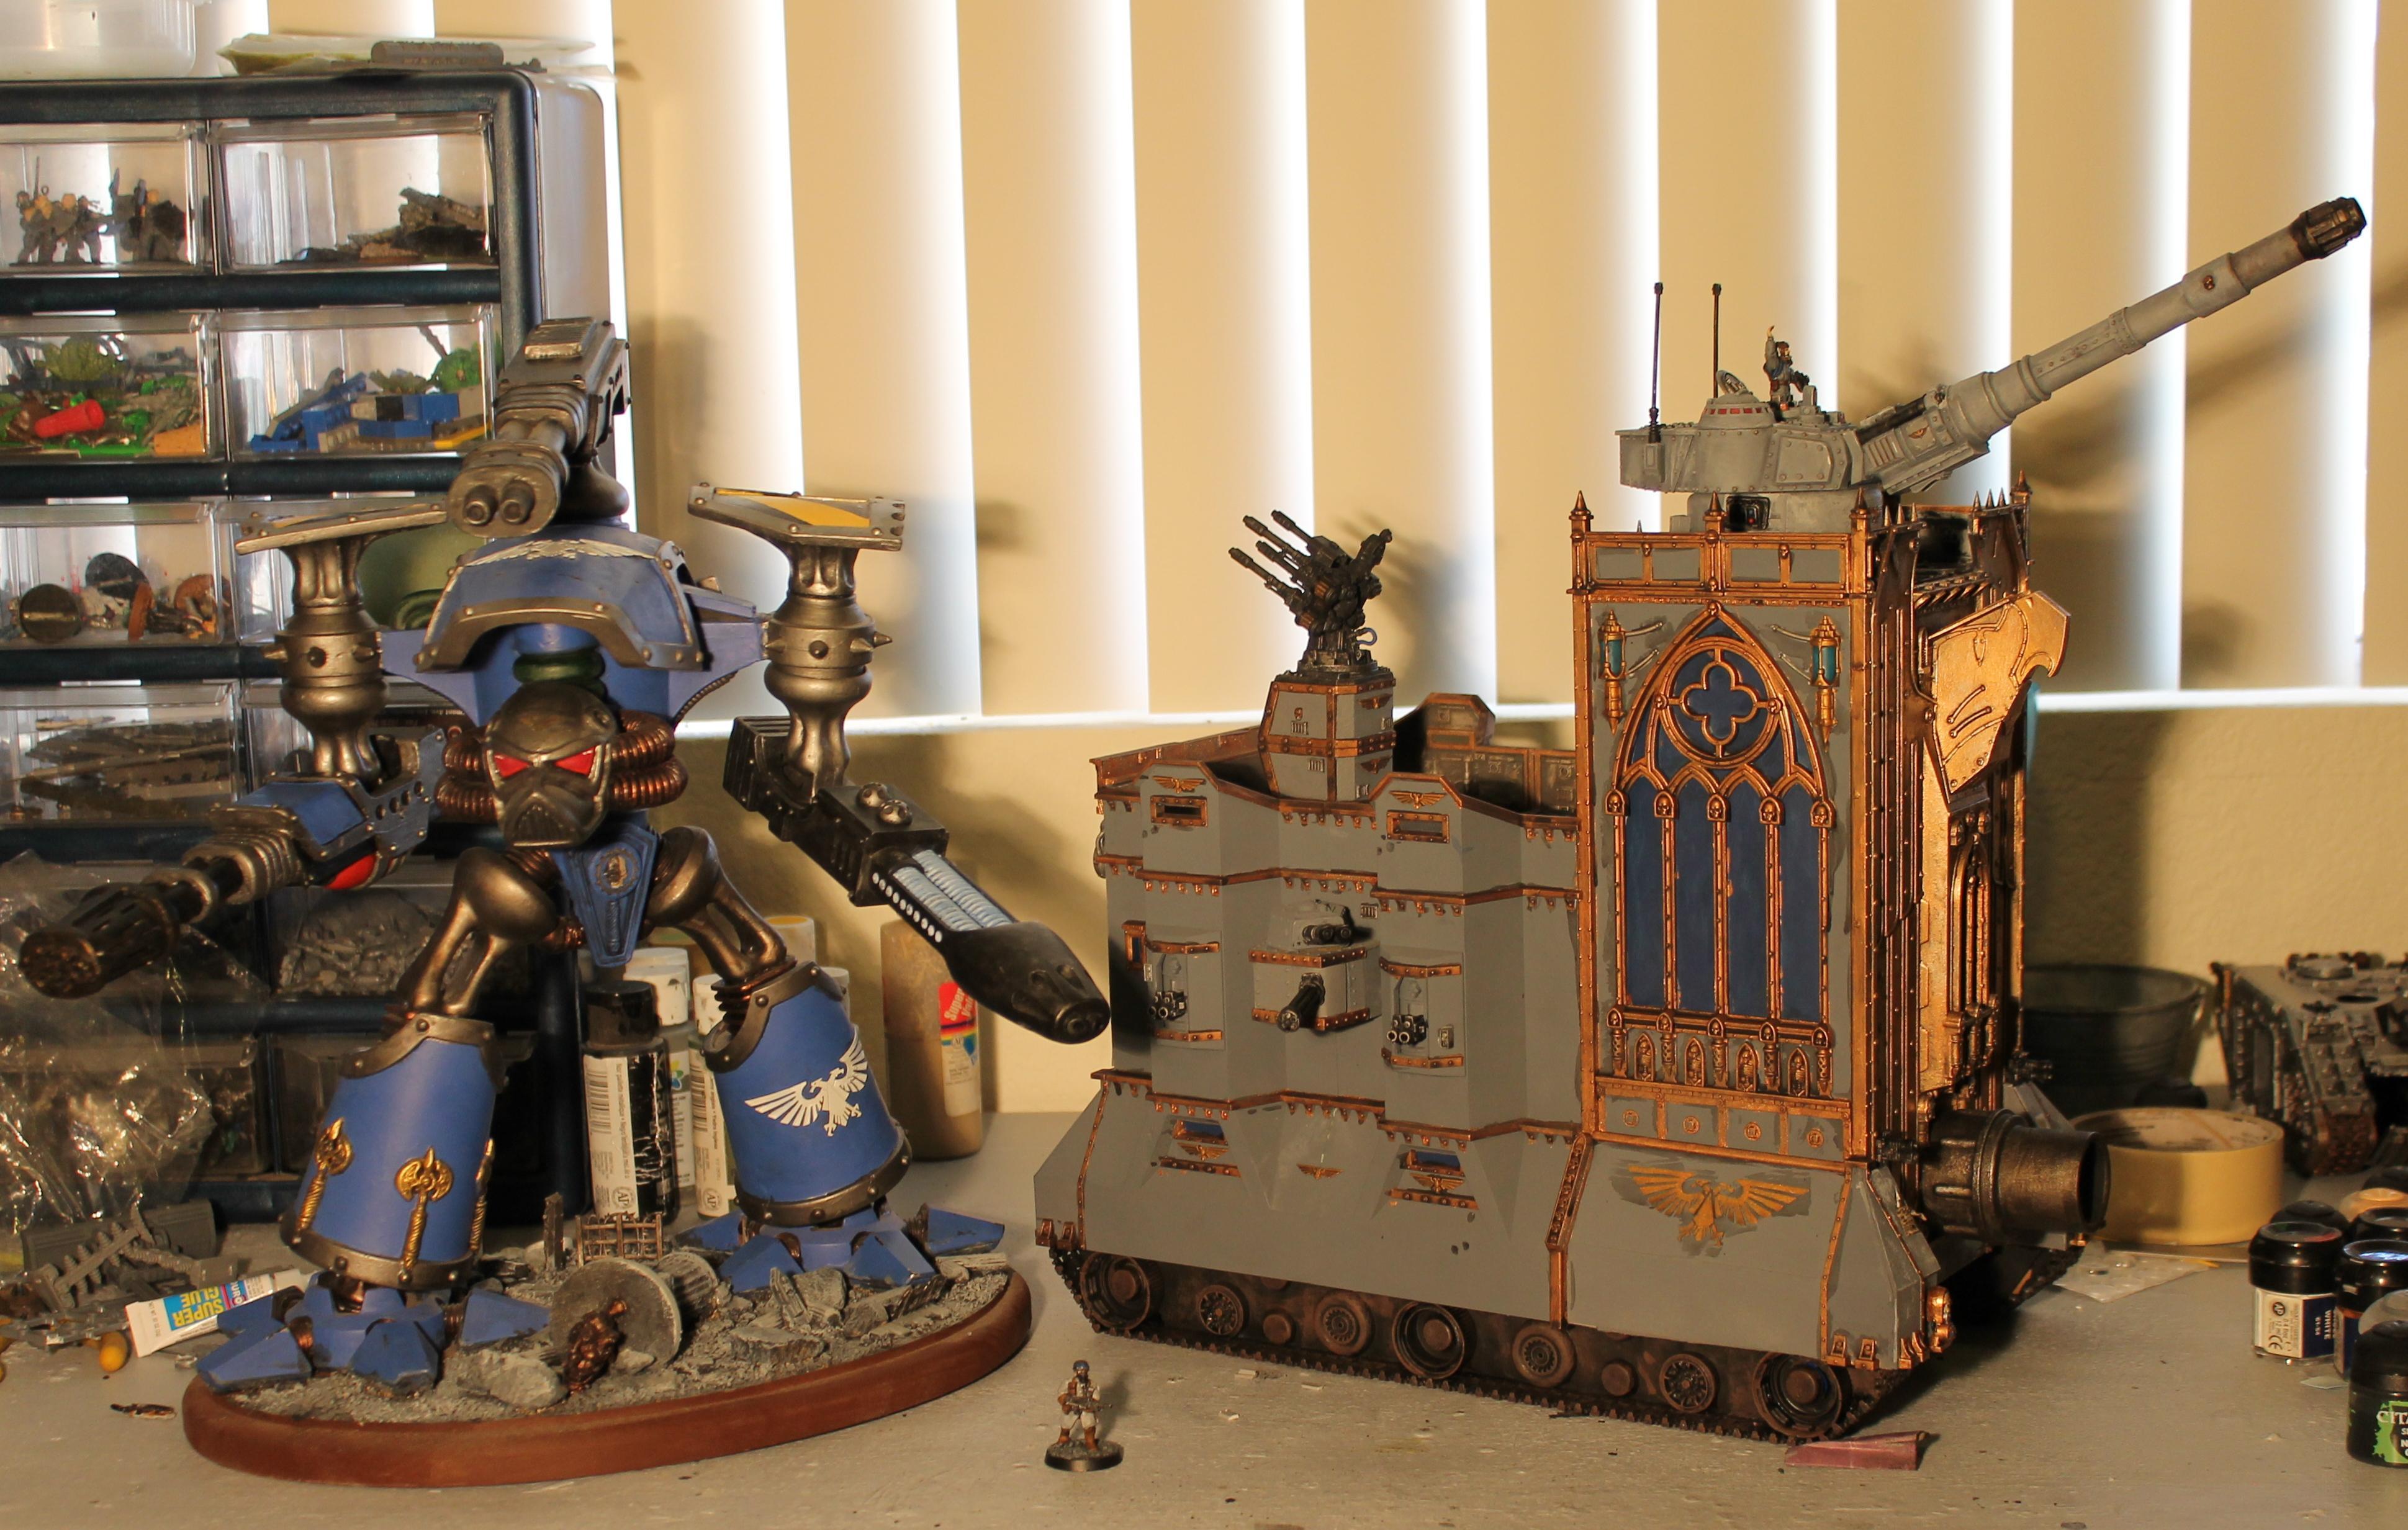 Imperial Guard, Leviathan, Reaver, Super-heavy, Titan